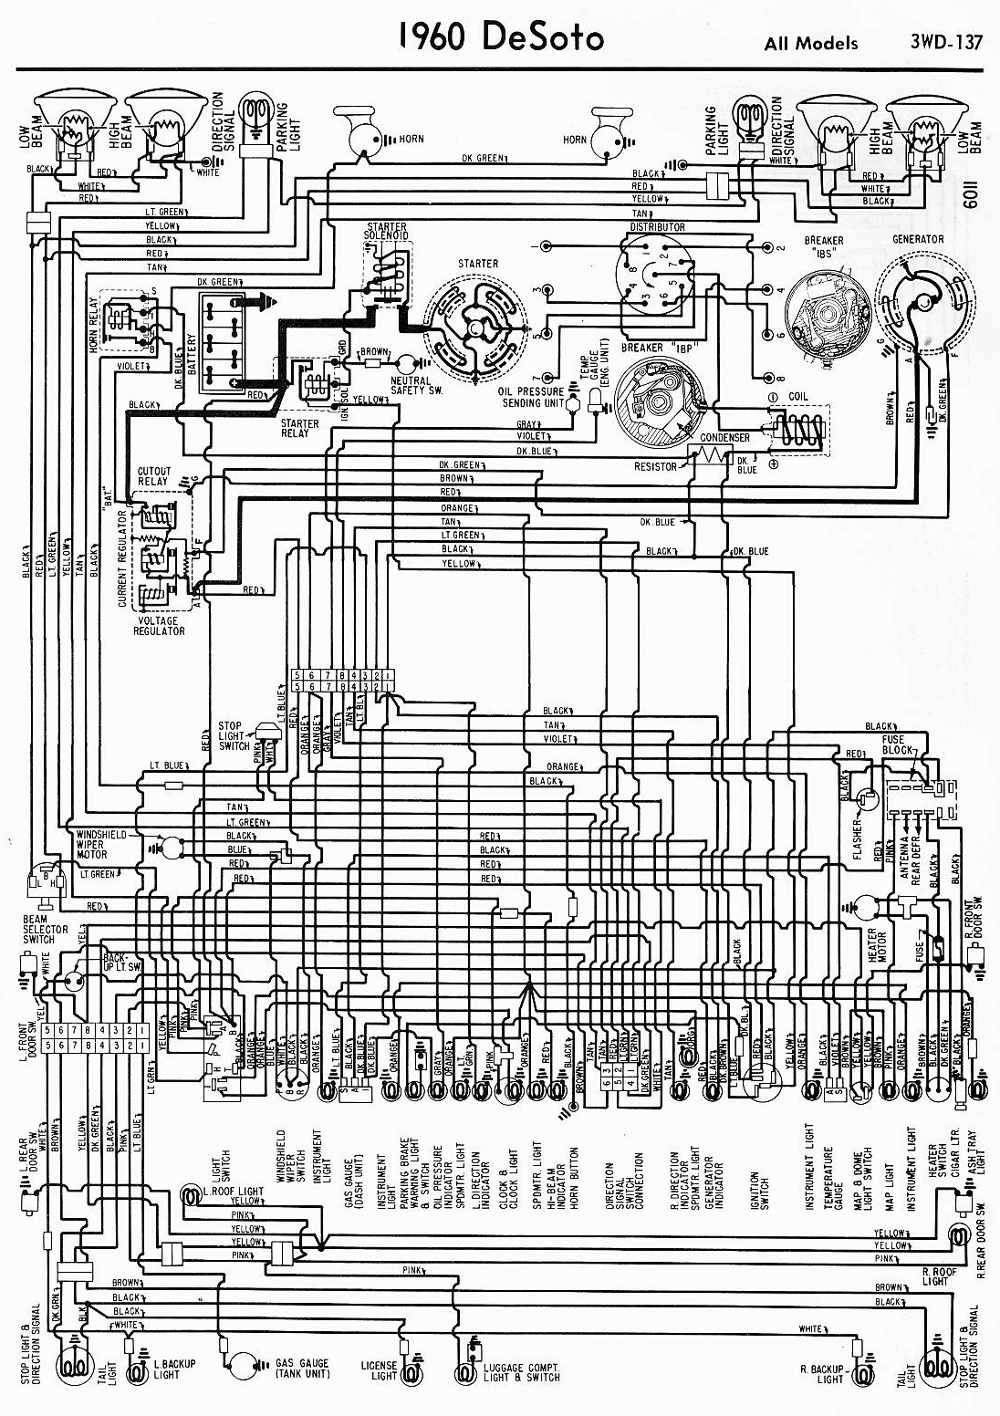 48 chrysler desoto wiring diagram chrysler crossfire